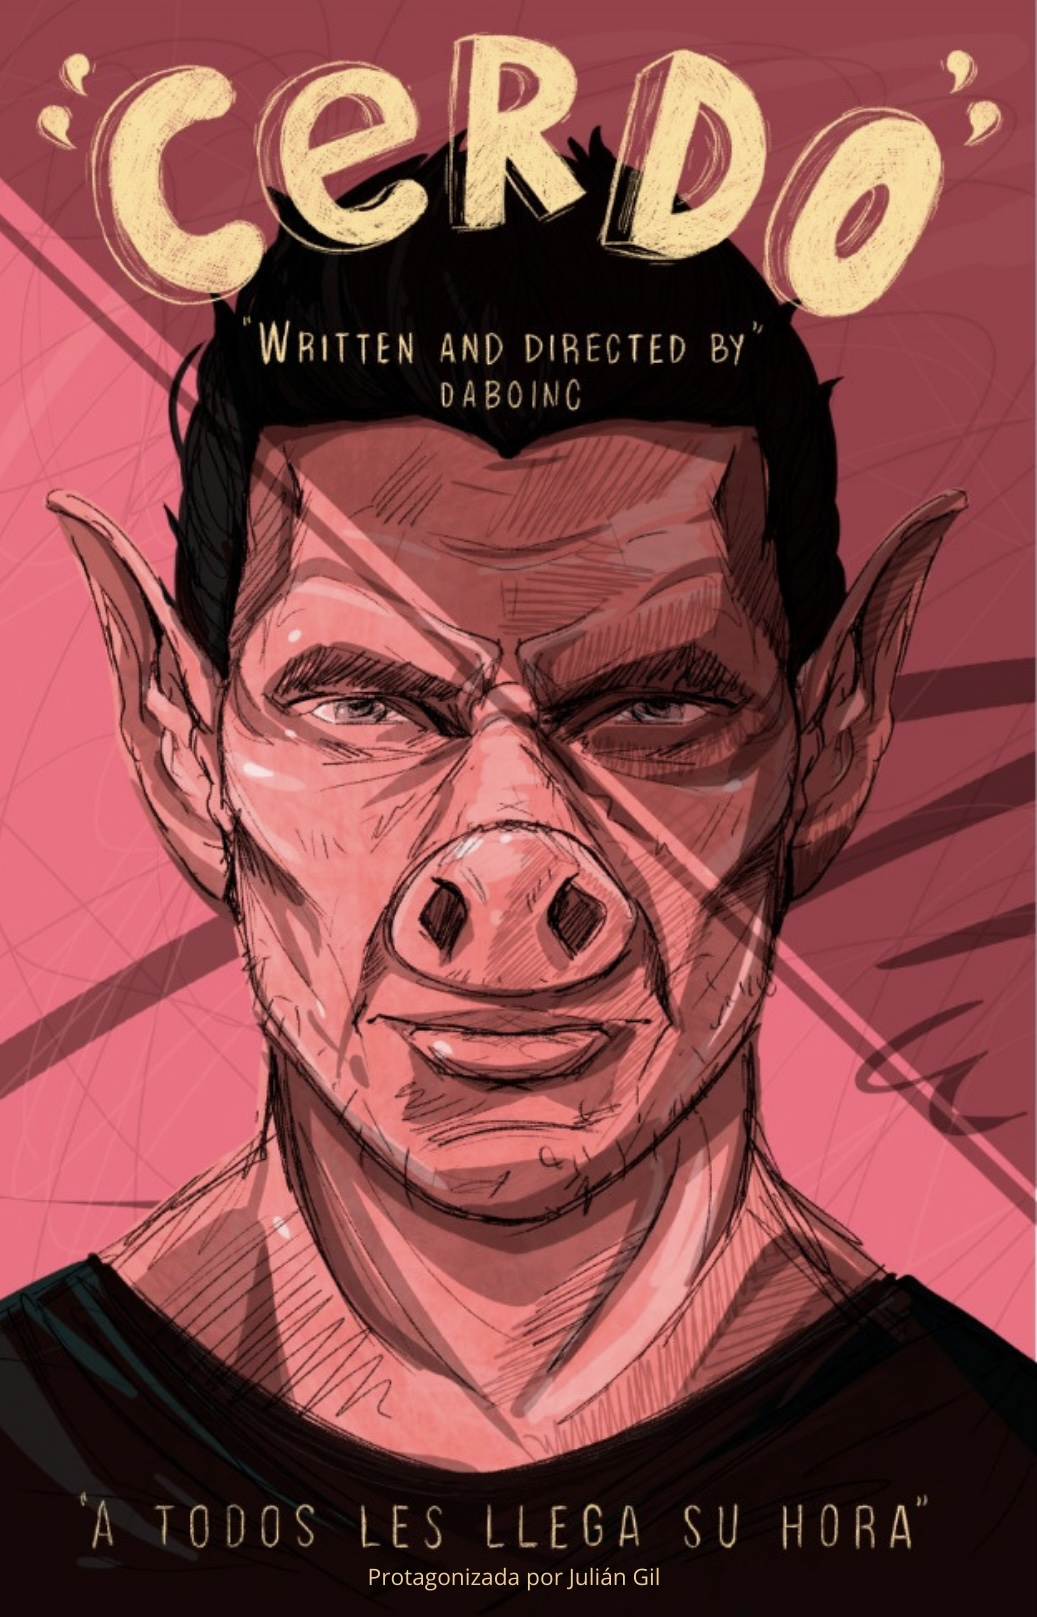 "Inicia el rodaje de ""Cerdo"", la ópera prima del venezolano Juan Carlos Daboin"